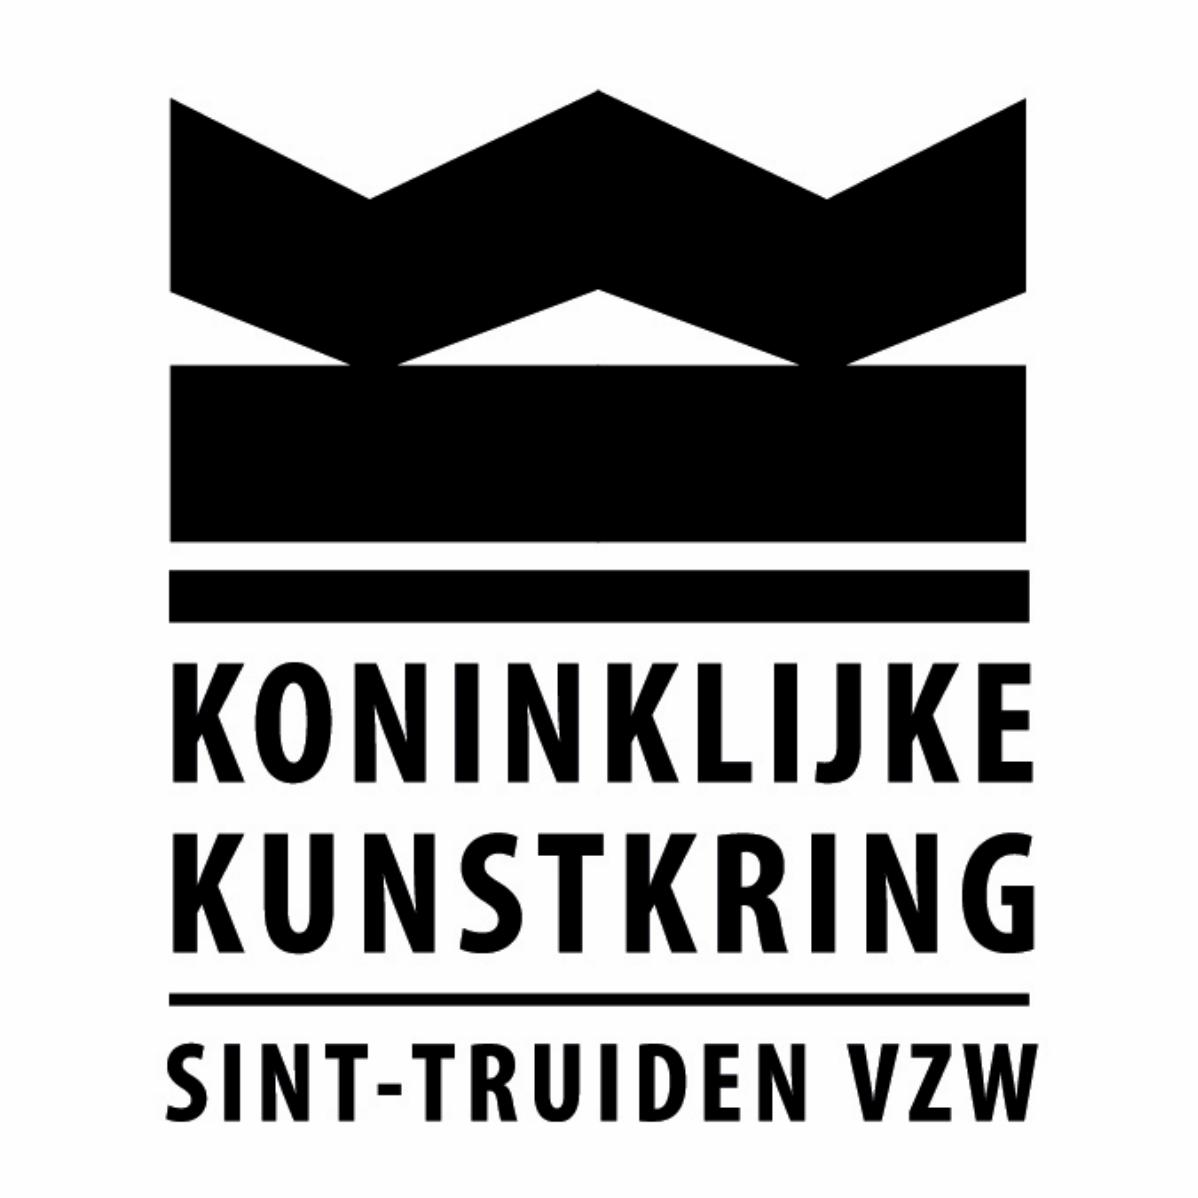 Koninklijke Kunstkring